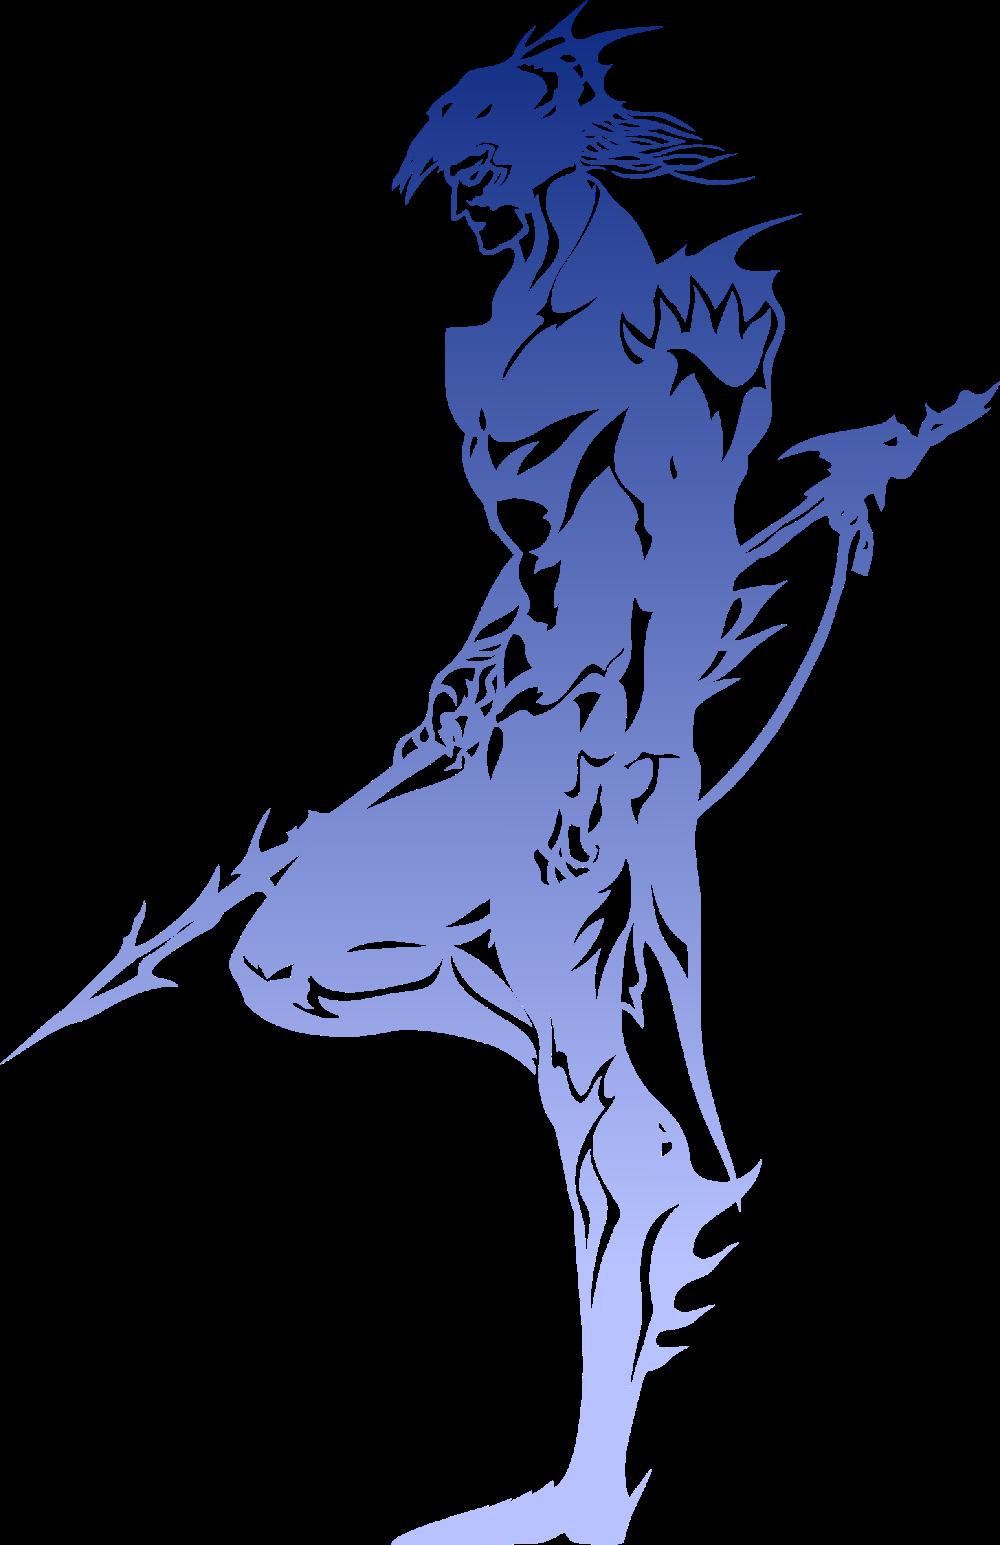 Original Final Fantasy IV logo by eldi13 on DeviantArt in